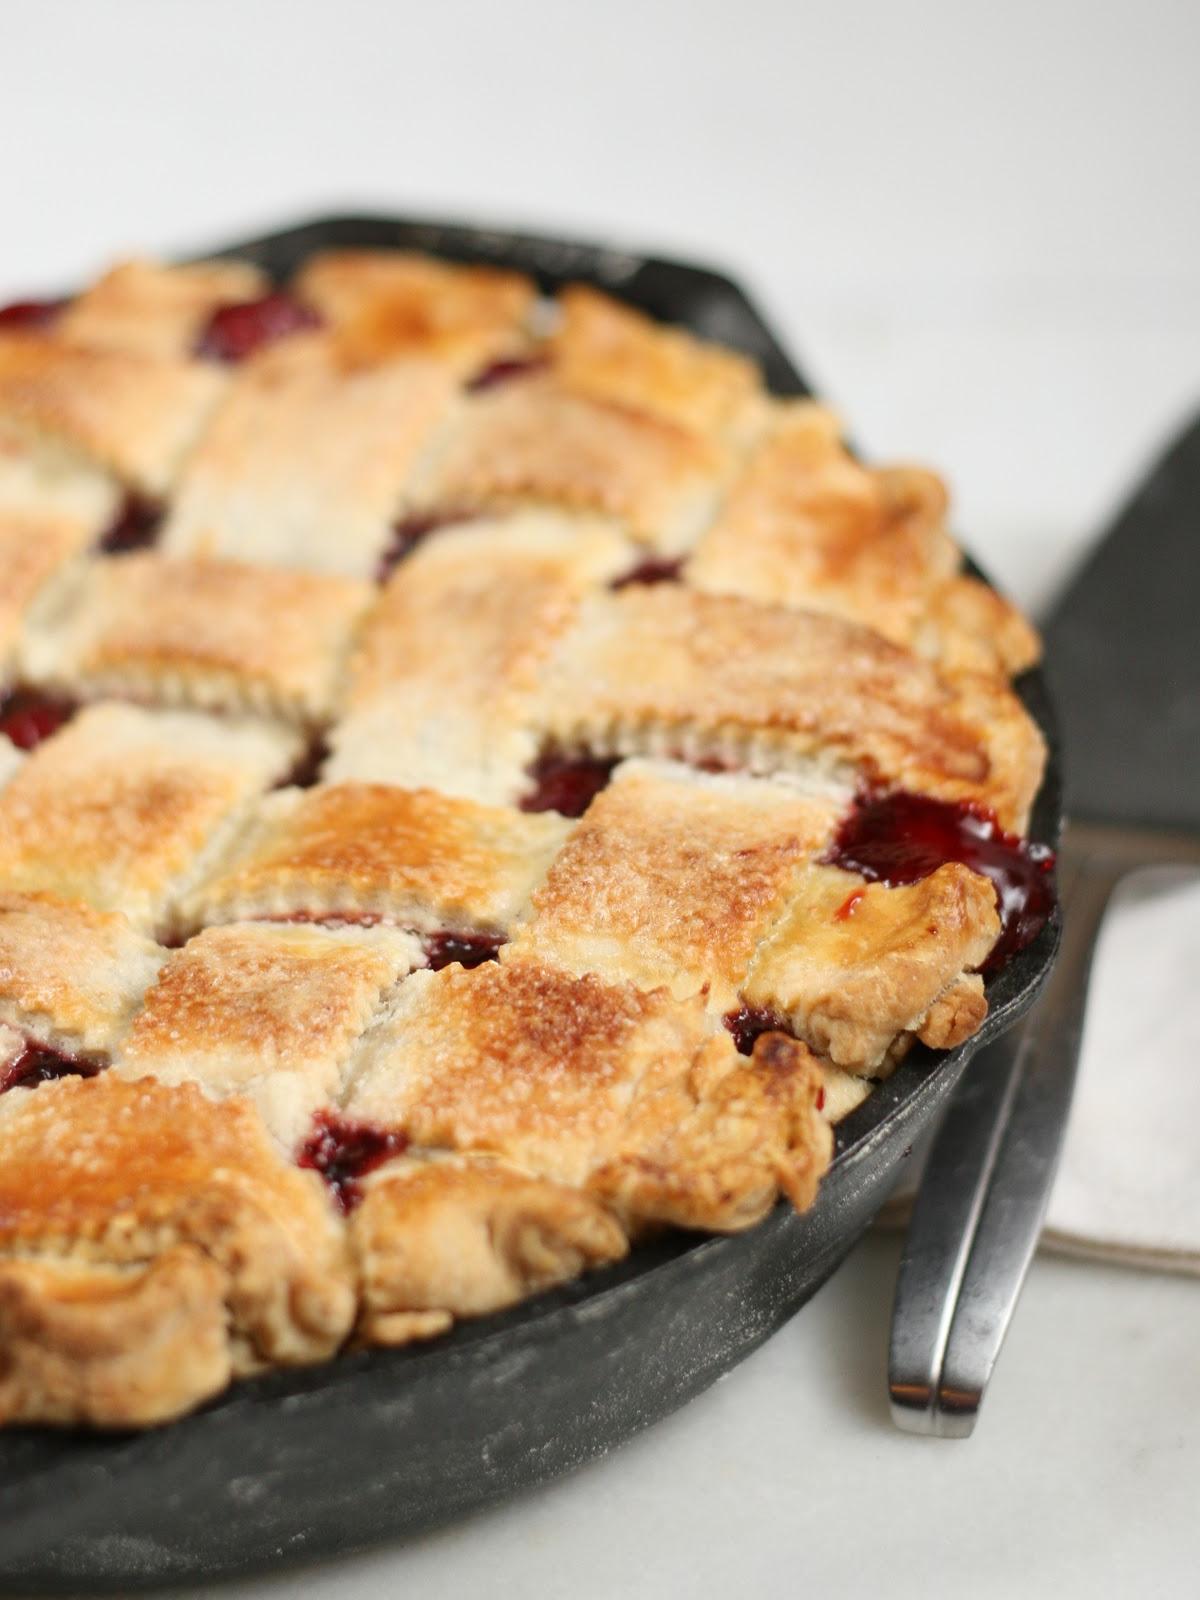 Cherry pie with lattice crust in dual handle cast iron skillet.